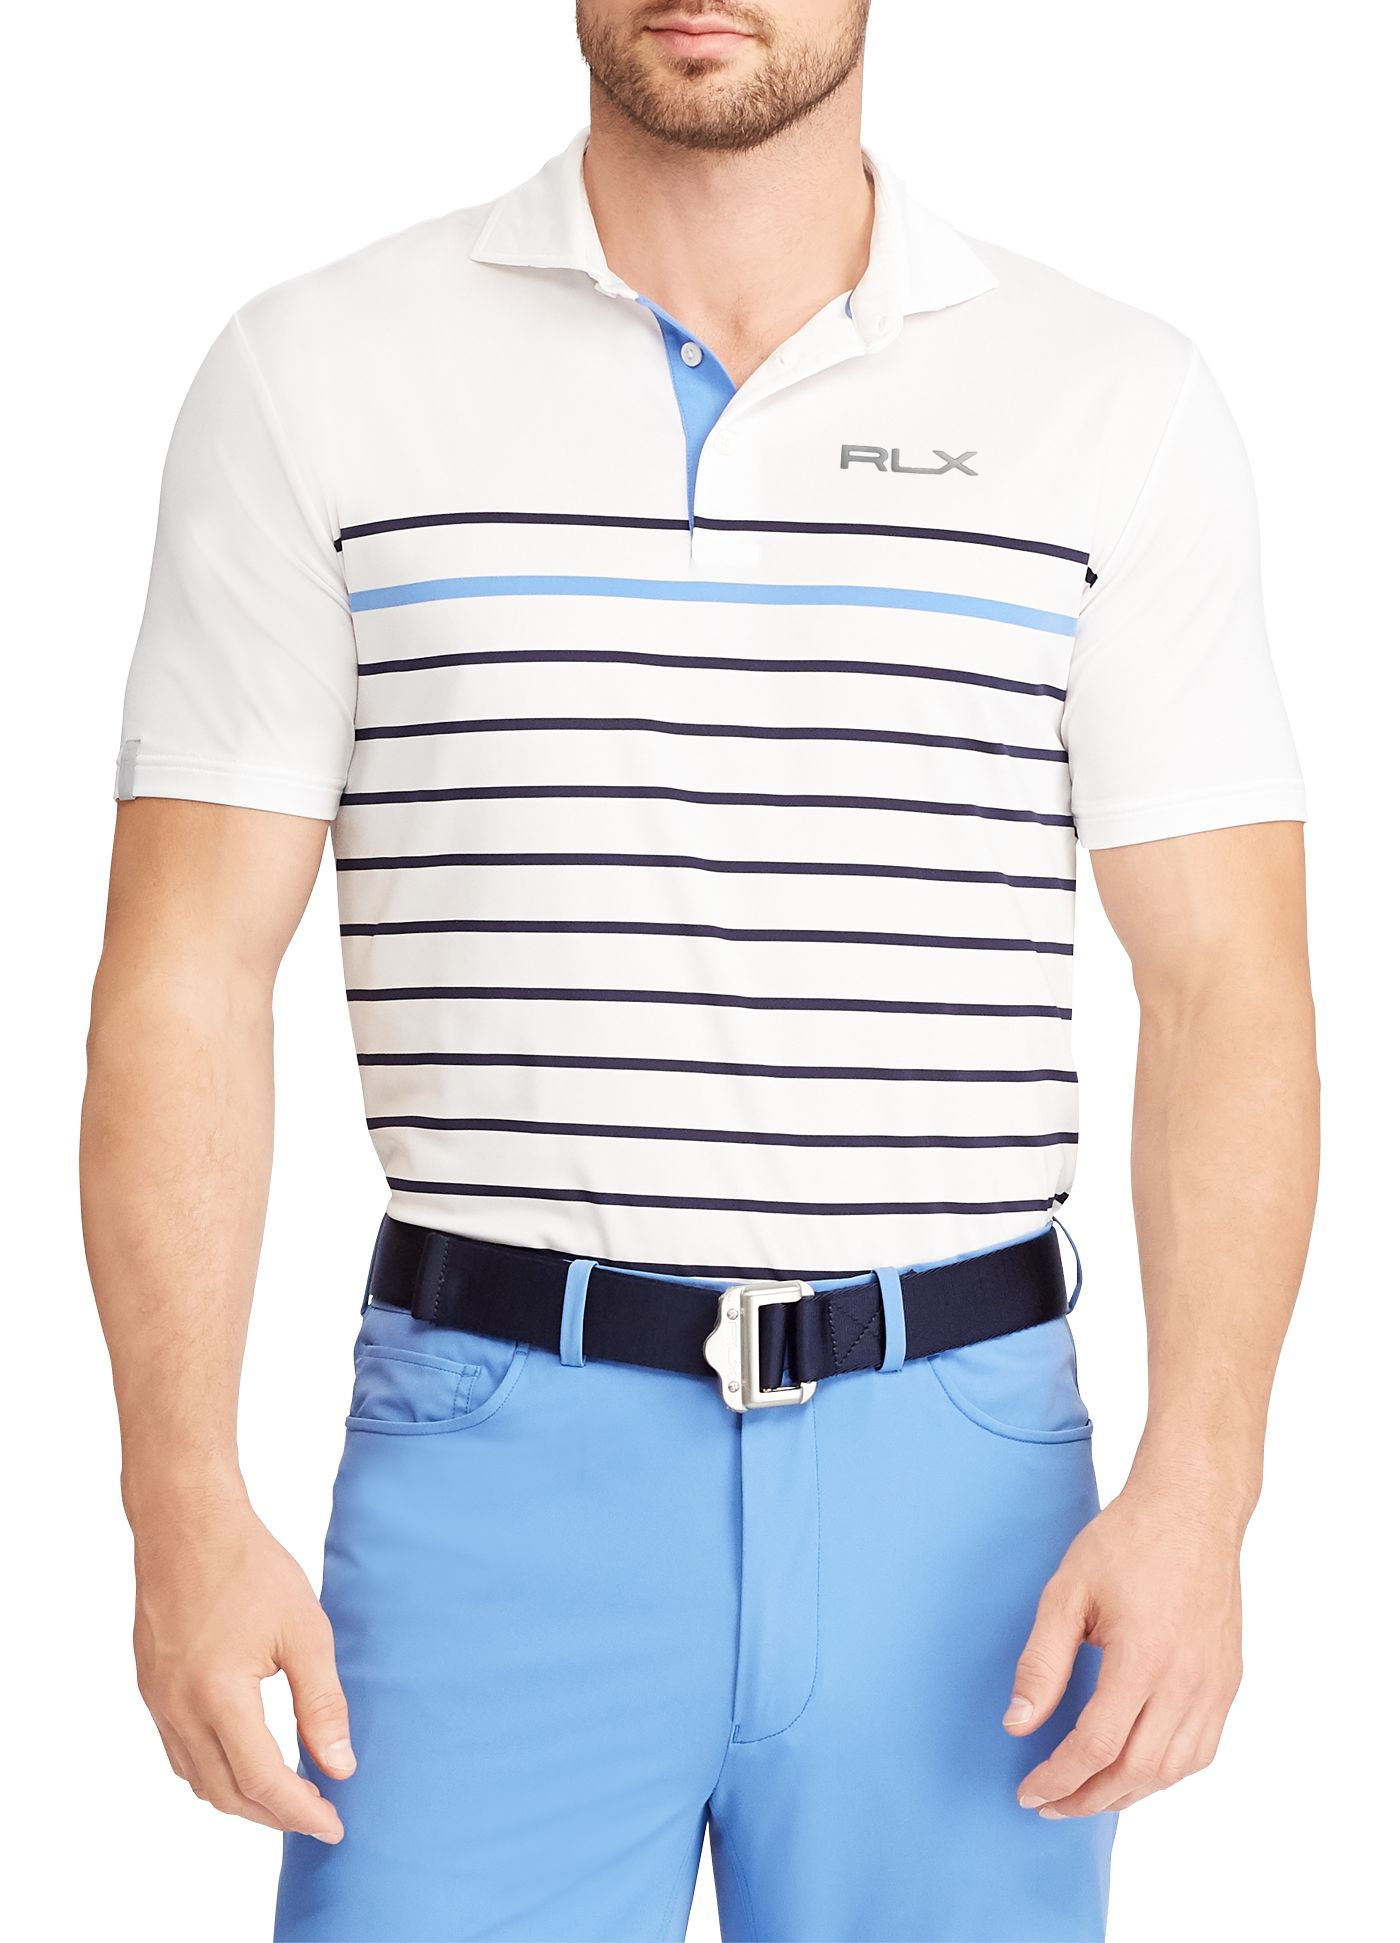 RLX Golf Men's Billy Horschel Striped Airflow Golf Polo